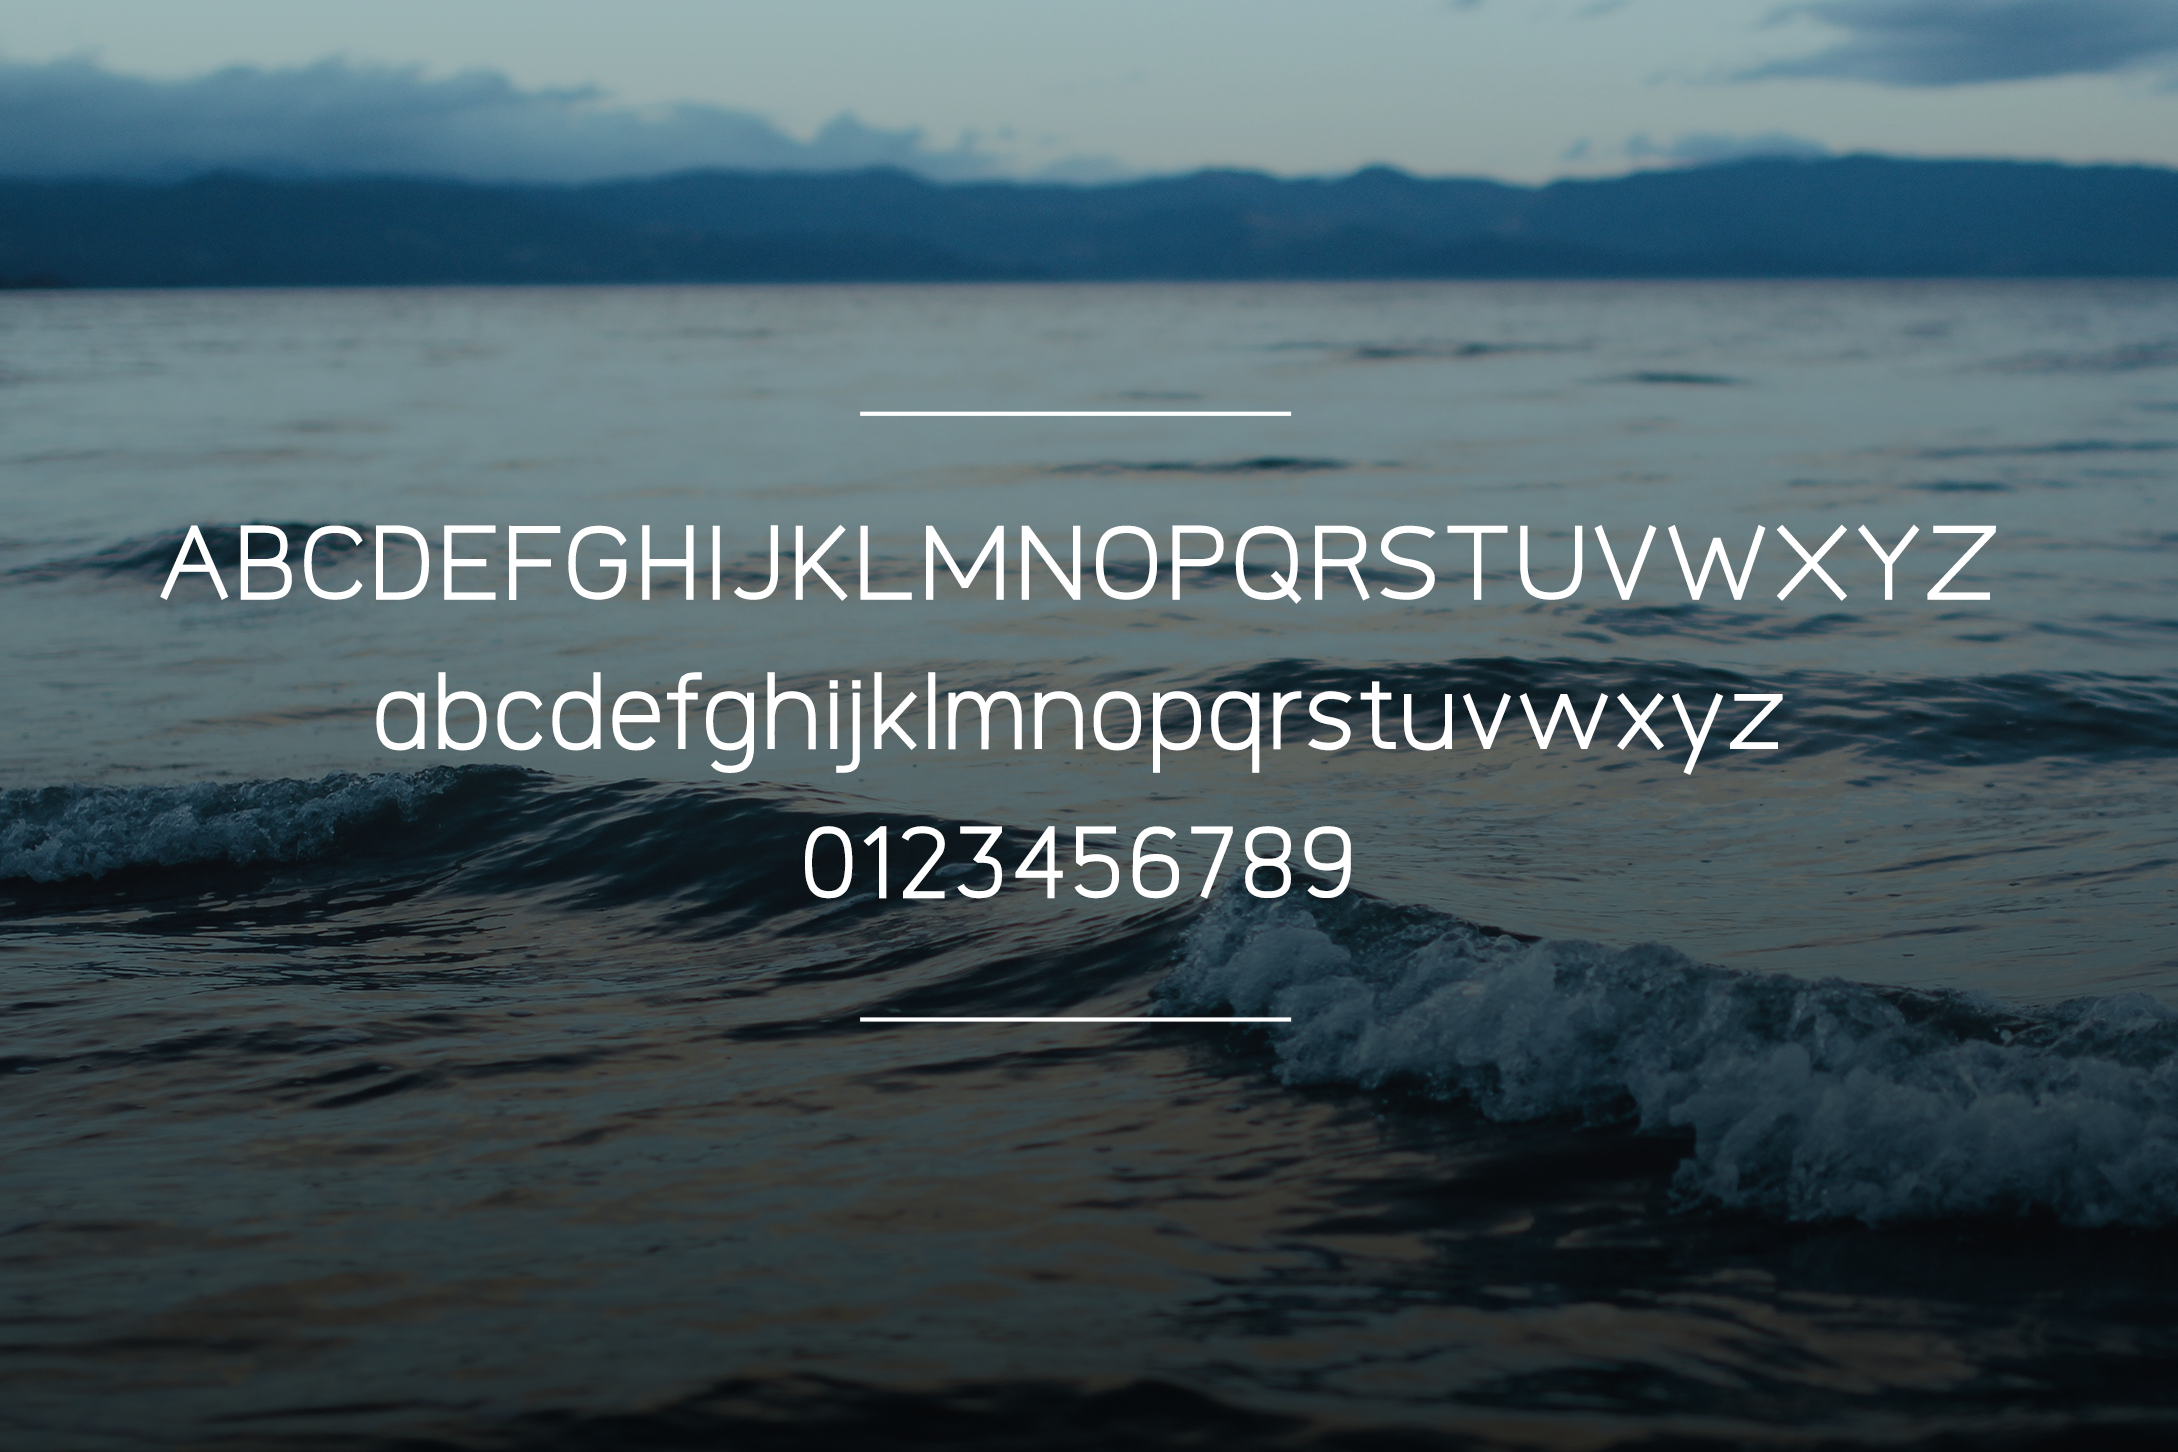 Logico-Sans Simple Modern Font example image 3